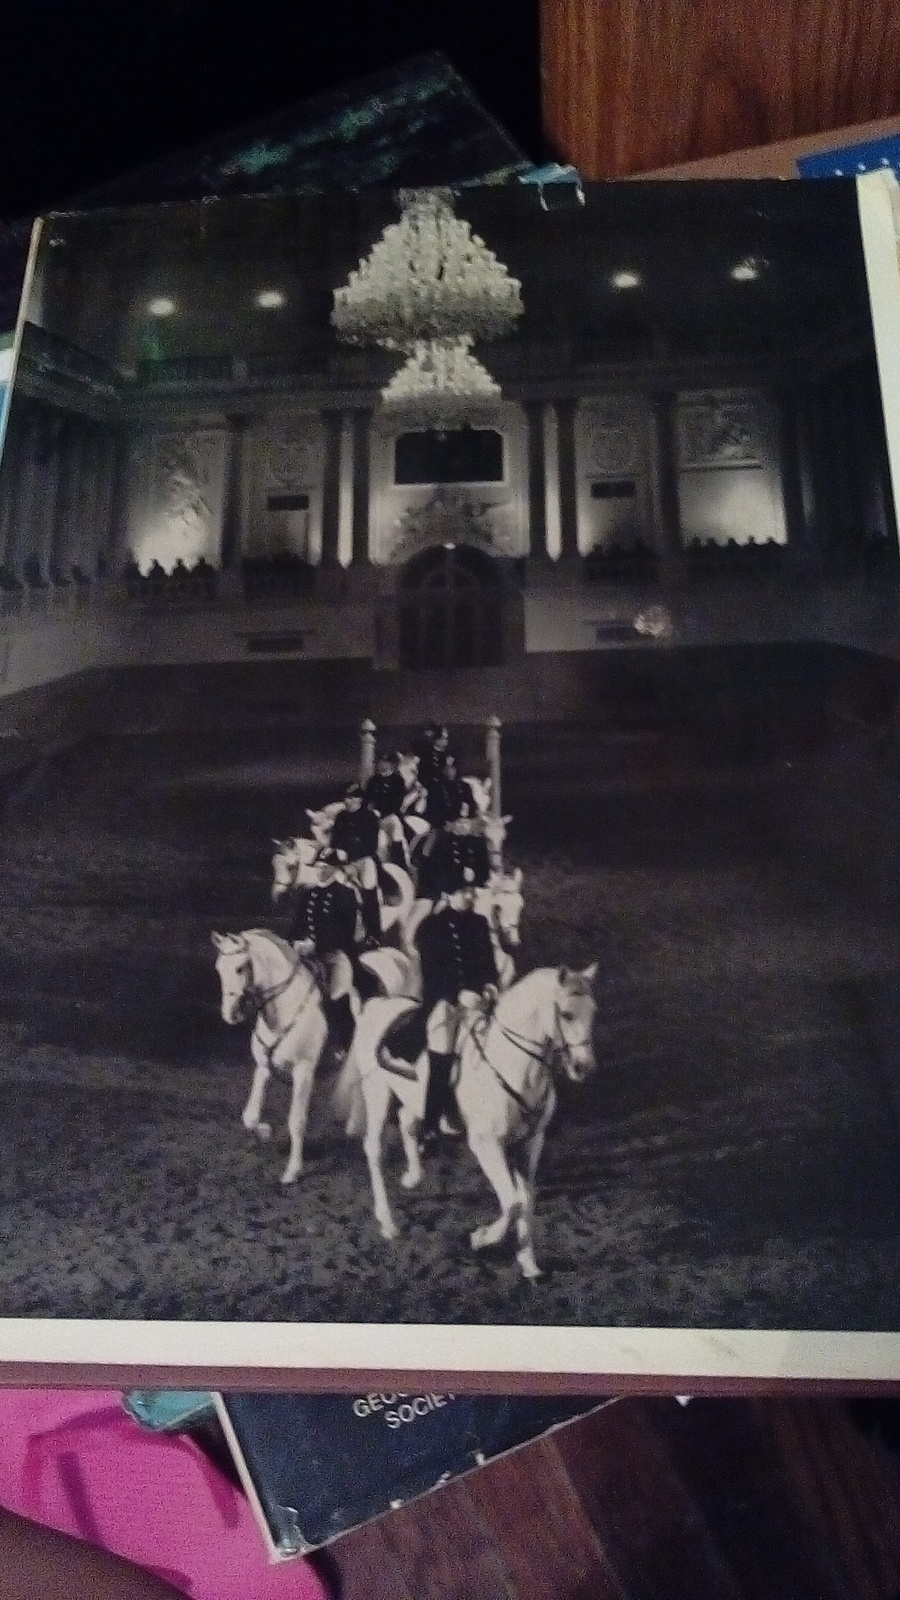 The white stallions of Vienna by Alois Podhajsky jvc140